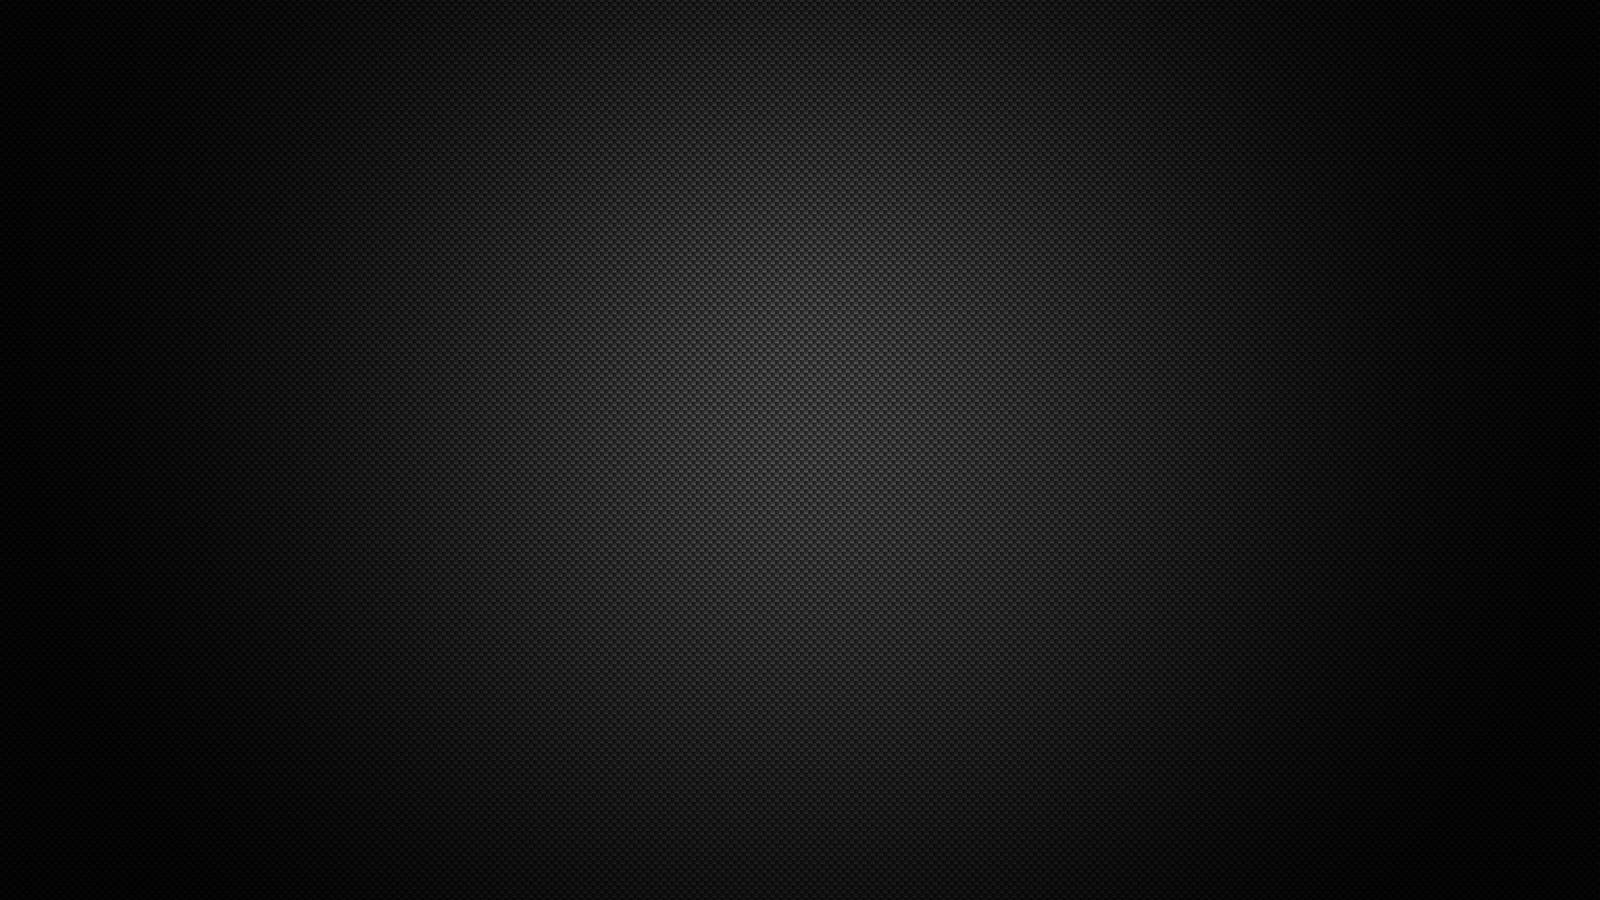 Carbon Fiber Windows Wallpapers Top Free Carbon Fiber Windows Backgrounds Wallpaperaccess